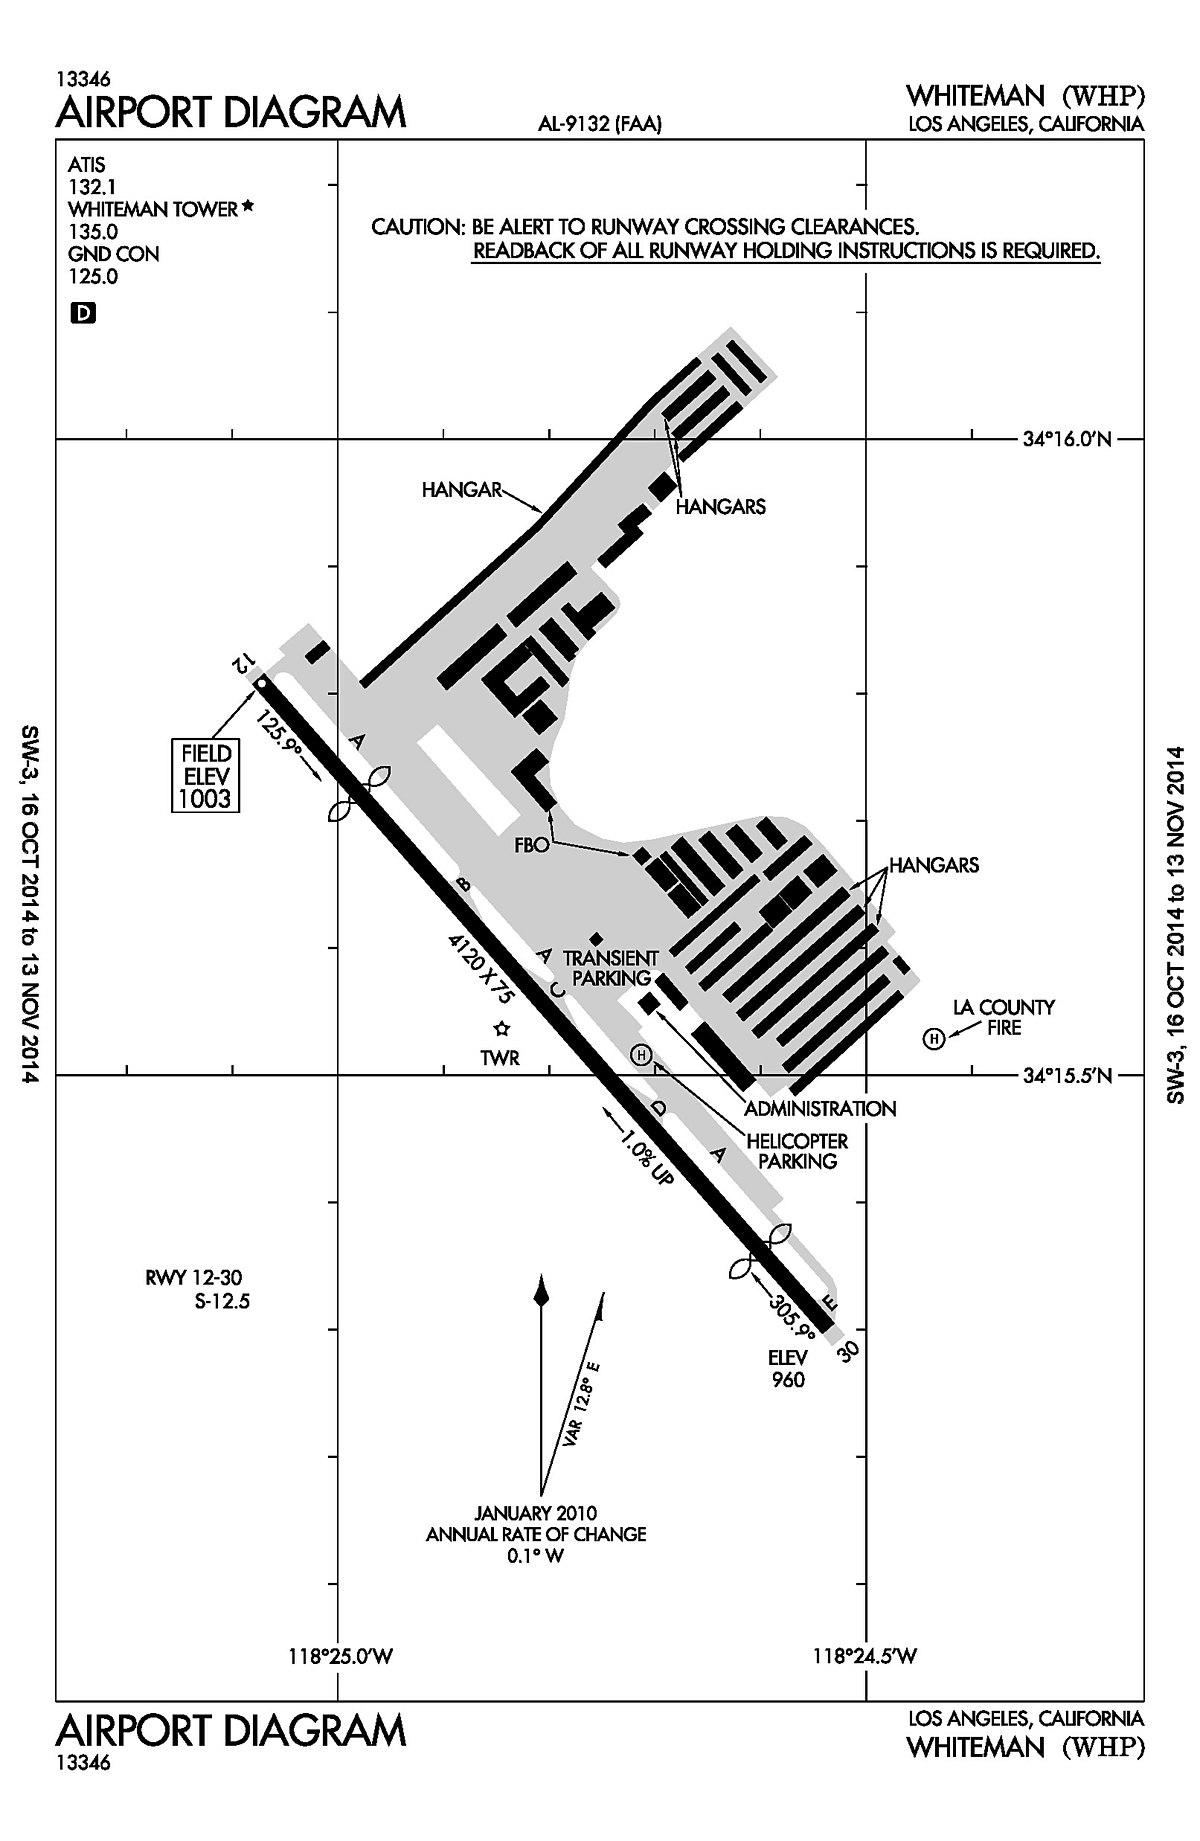 Whiteman Airport